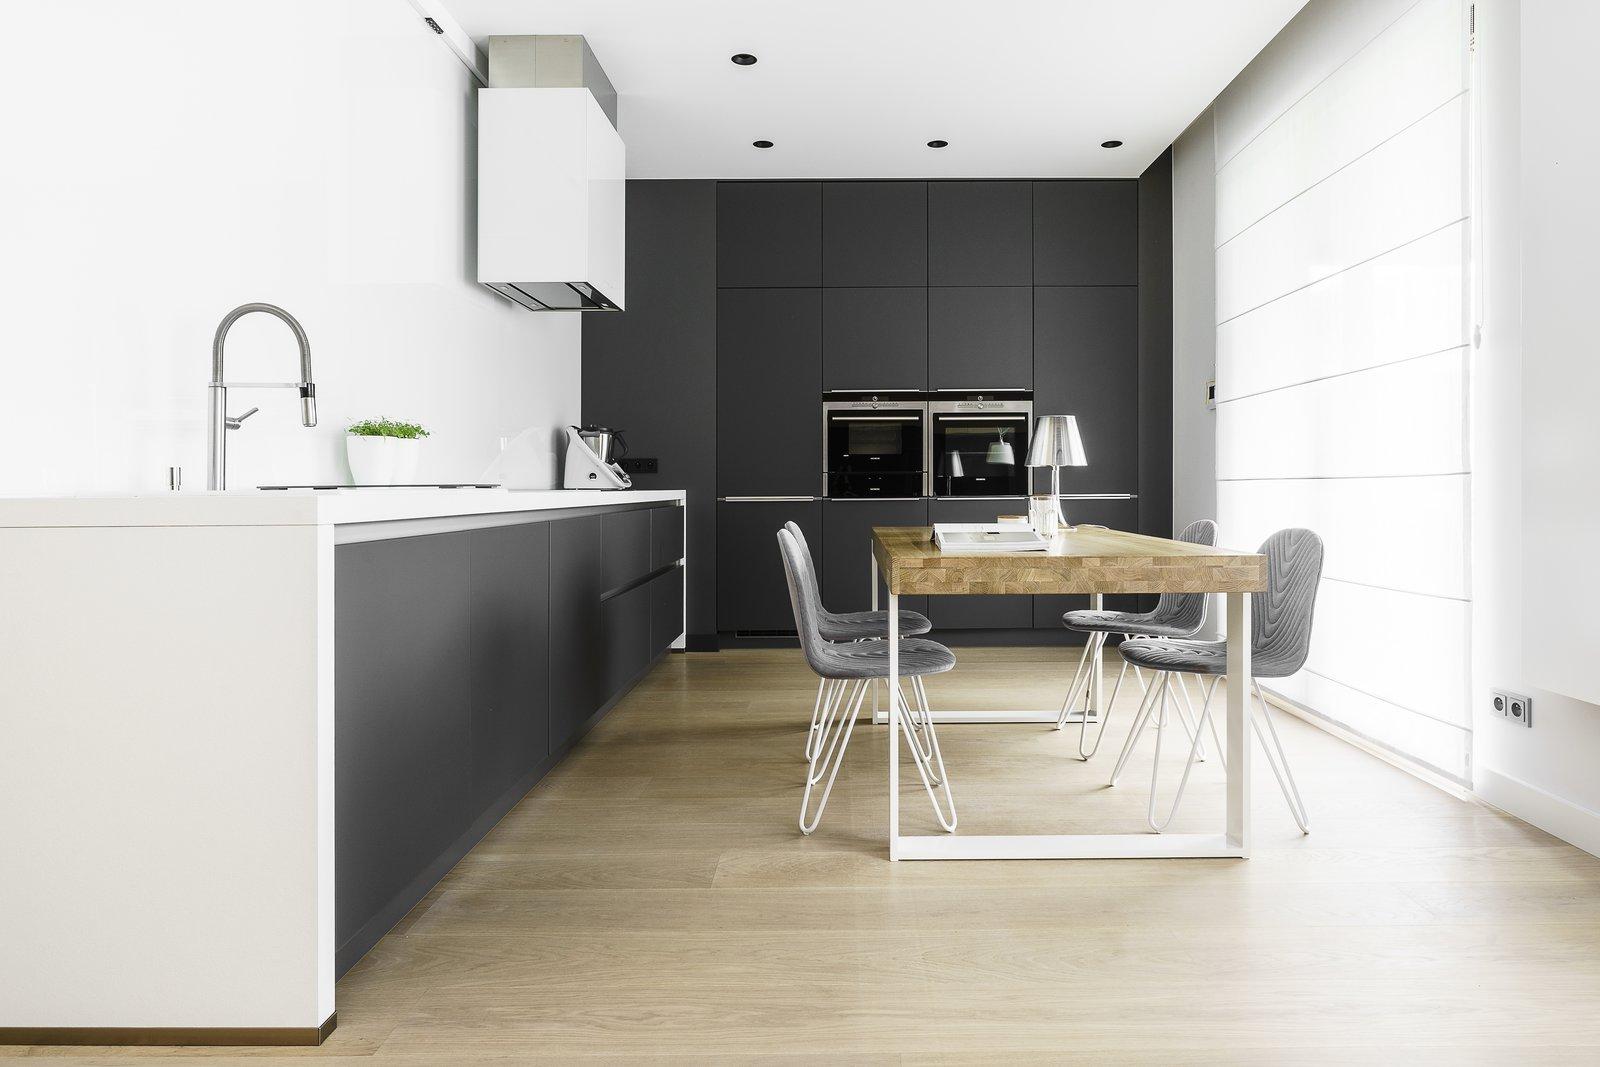 Kitchen kitchen  Photos from Nowe Orlowo 3